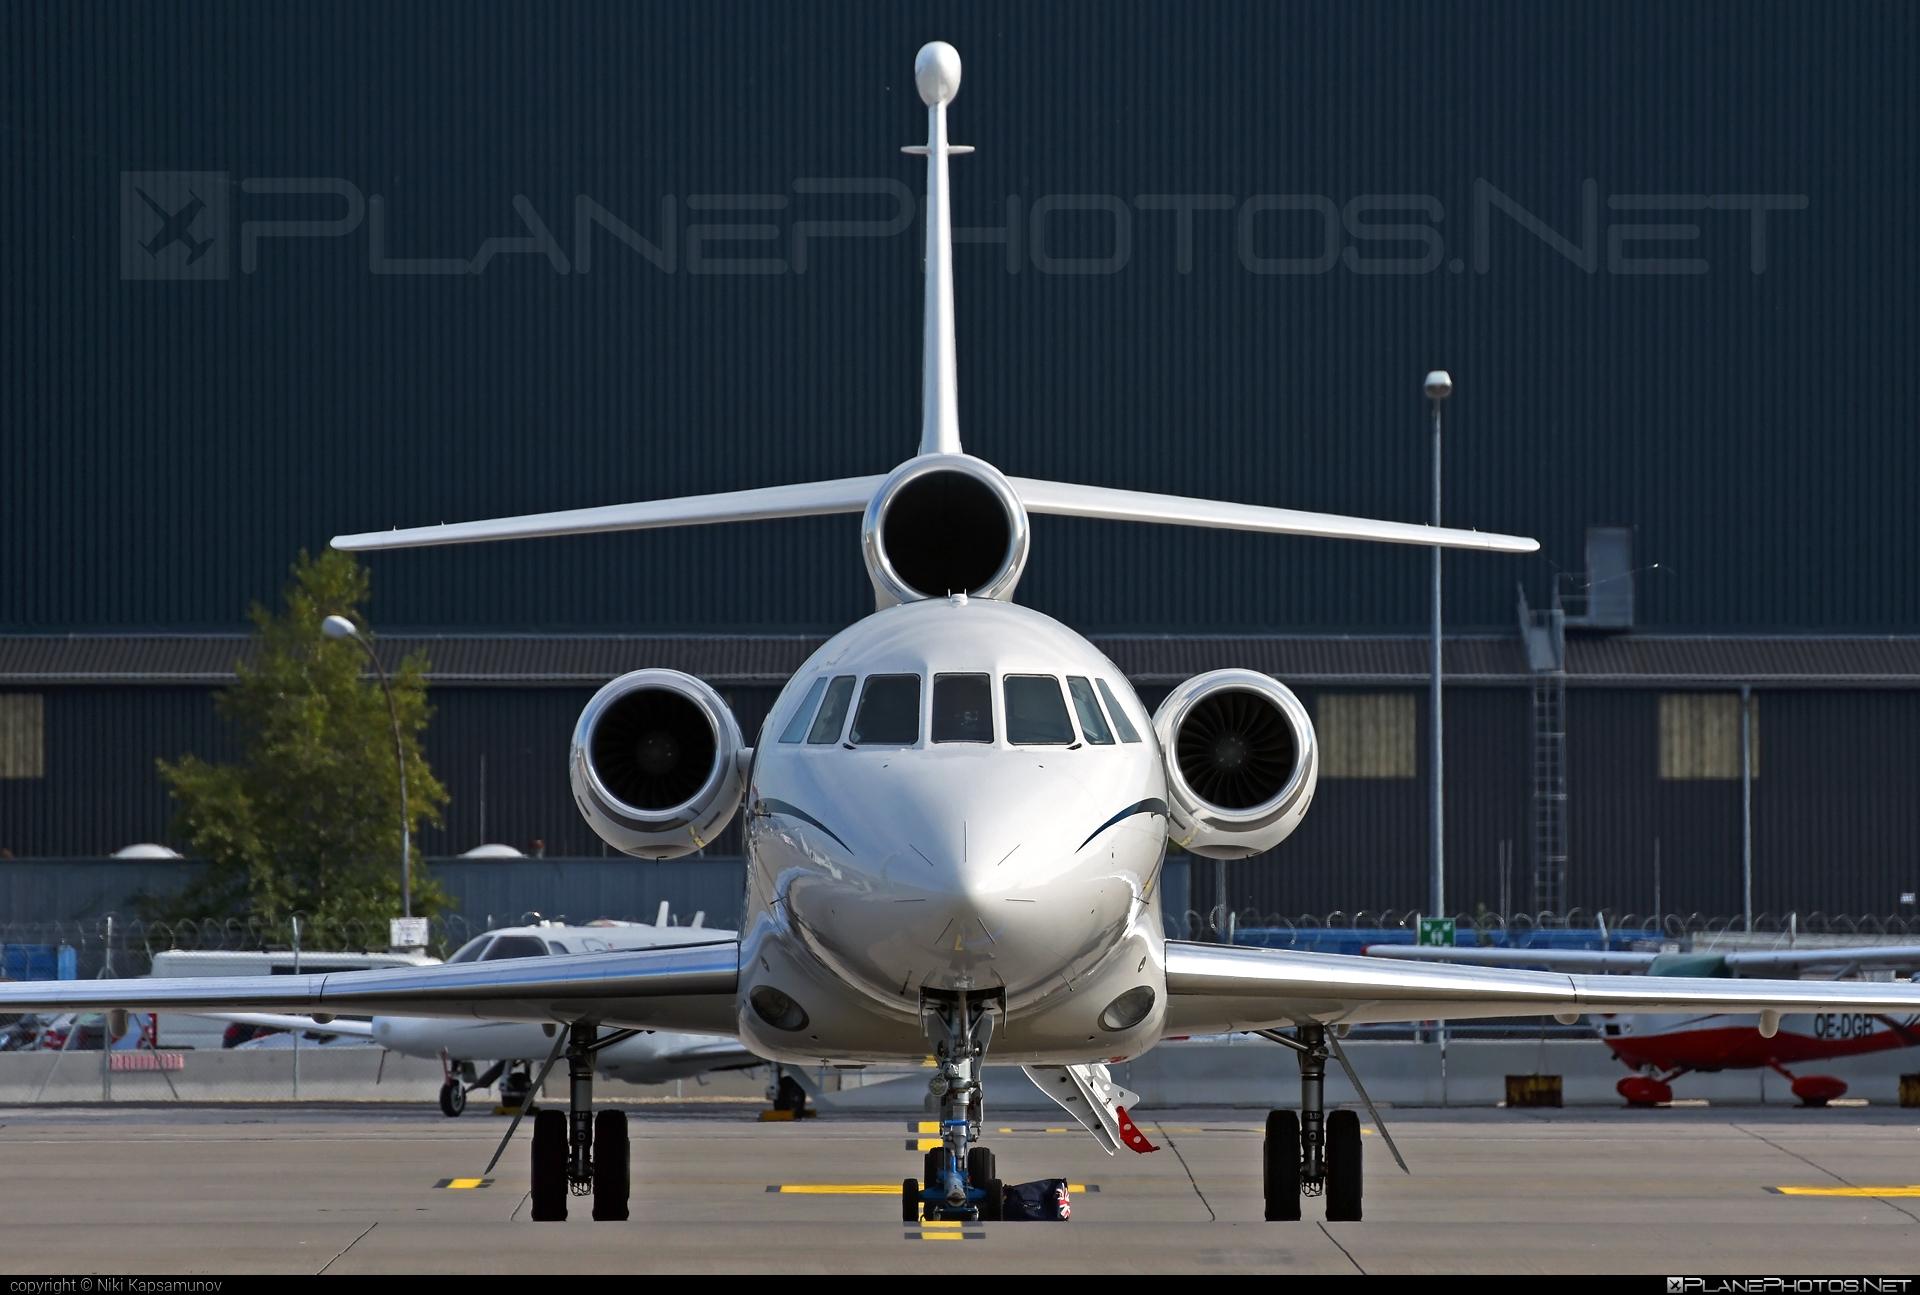 Dassault Falcon 900EX - M-ODKZ operated by Skylane LP #dassault #skylanelp